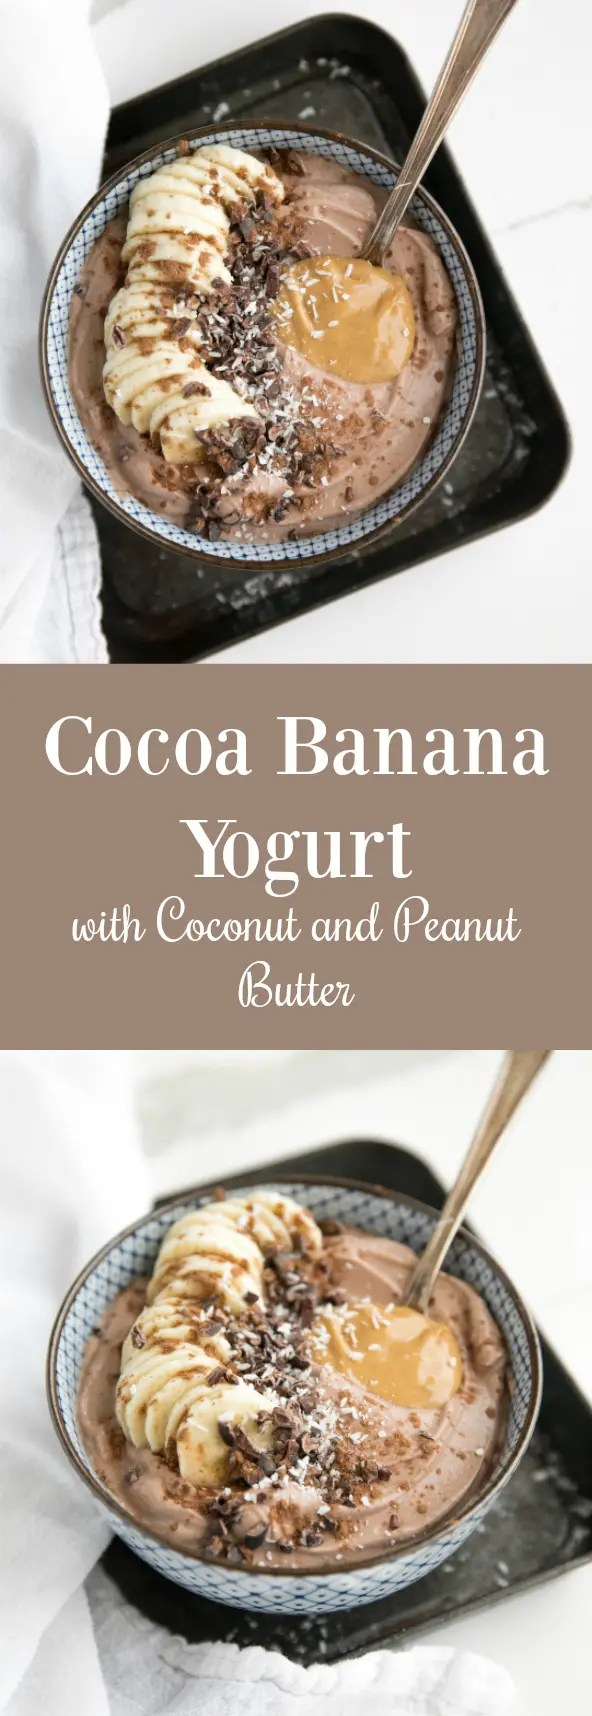 Rich, creamy and chocolatey, this Cocoa Banana Yogurt is delicious for breakfast or dessert! Sweetened with honey and banana, this bowl of creamy yogurt has no processed sugars. #breakfast #dessert #healthy #healthyrecipies #snack #banana #yogurt